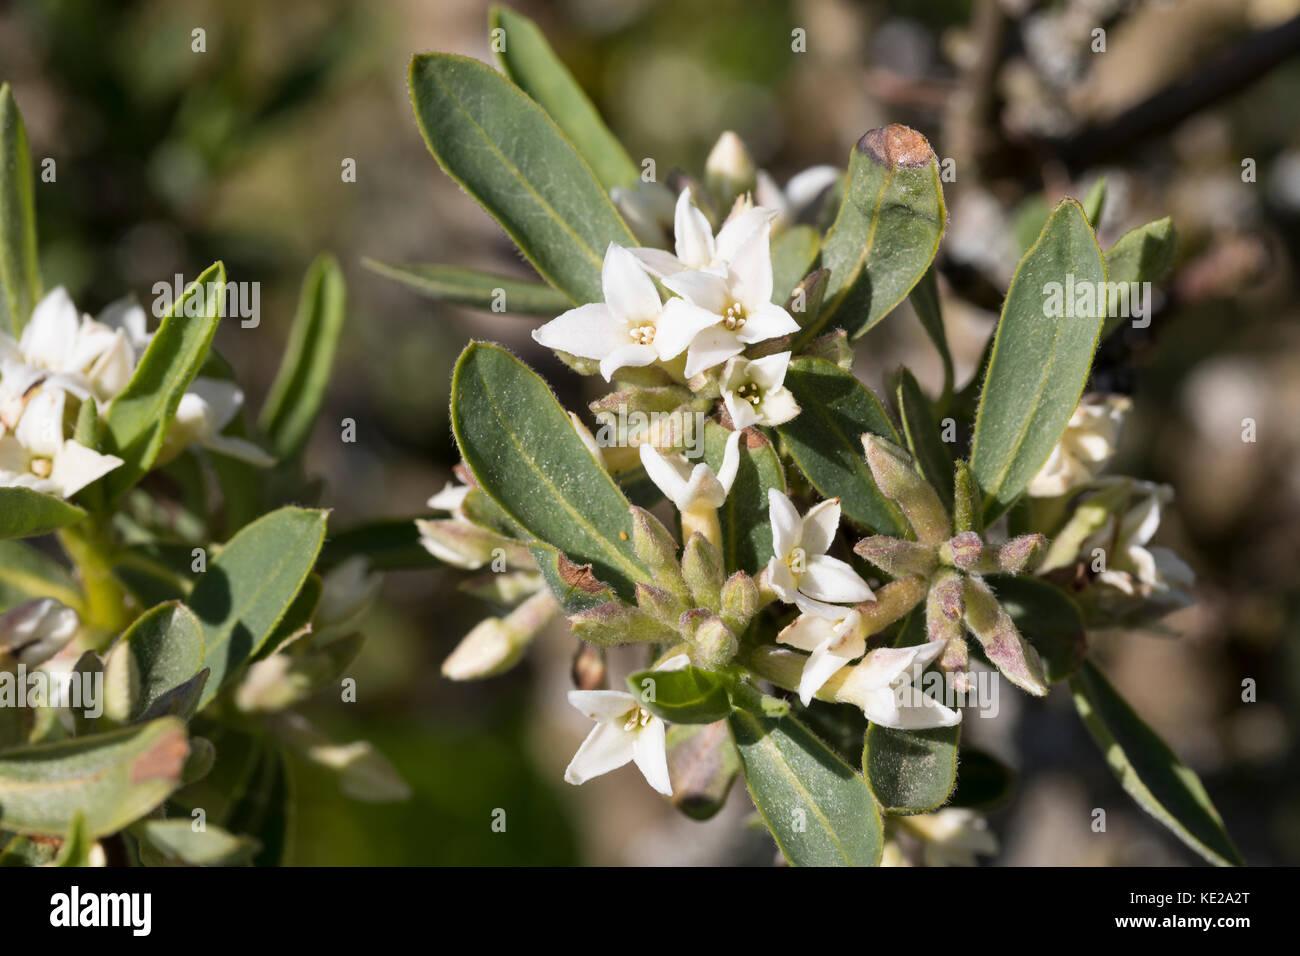 Kaukasischer Seidelbast, Daphne caucasica, Caucasian Daphne - Stock Image